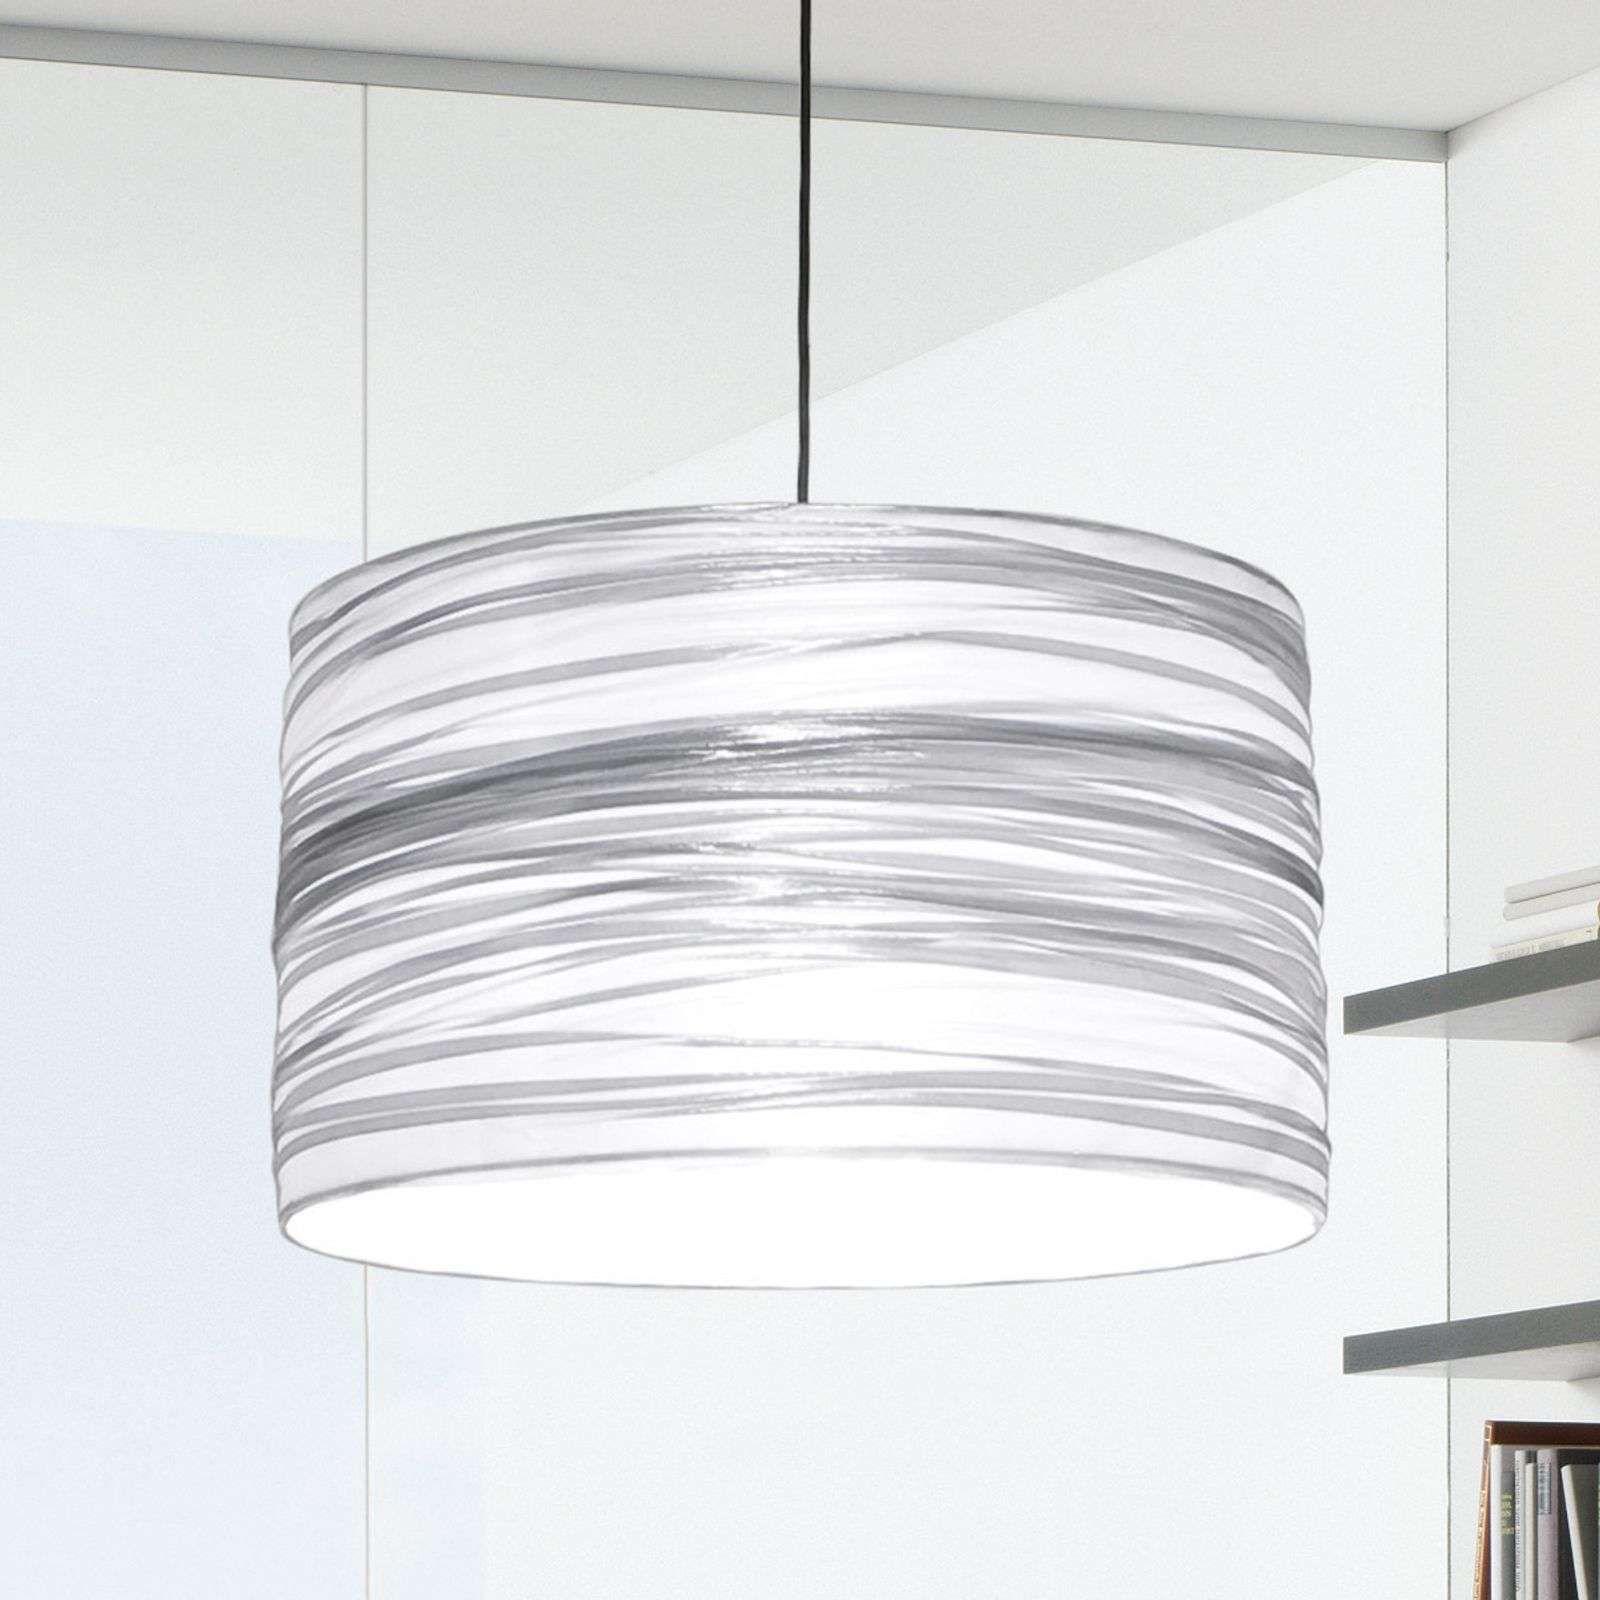 Pendelleuchte Wohnzimmer Lampensockel G9 Deckenlampe Flur Lang Badezimmer Wandleuchte Led Led Lampe Ohne Hangeleuchte Led Aussenleuchten Deckenleuchten